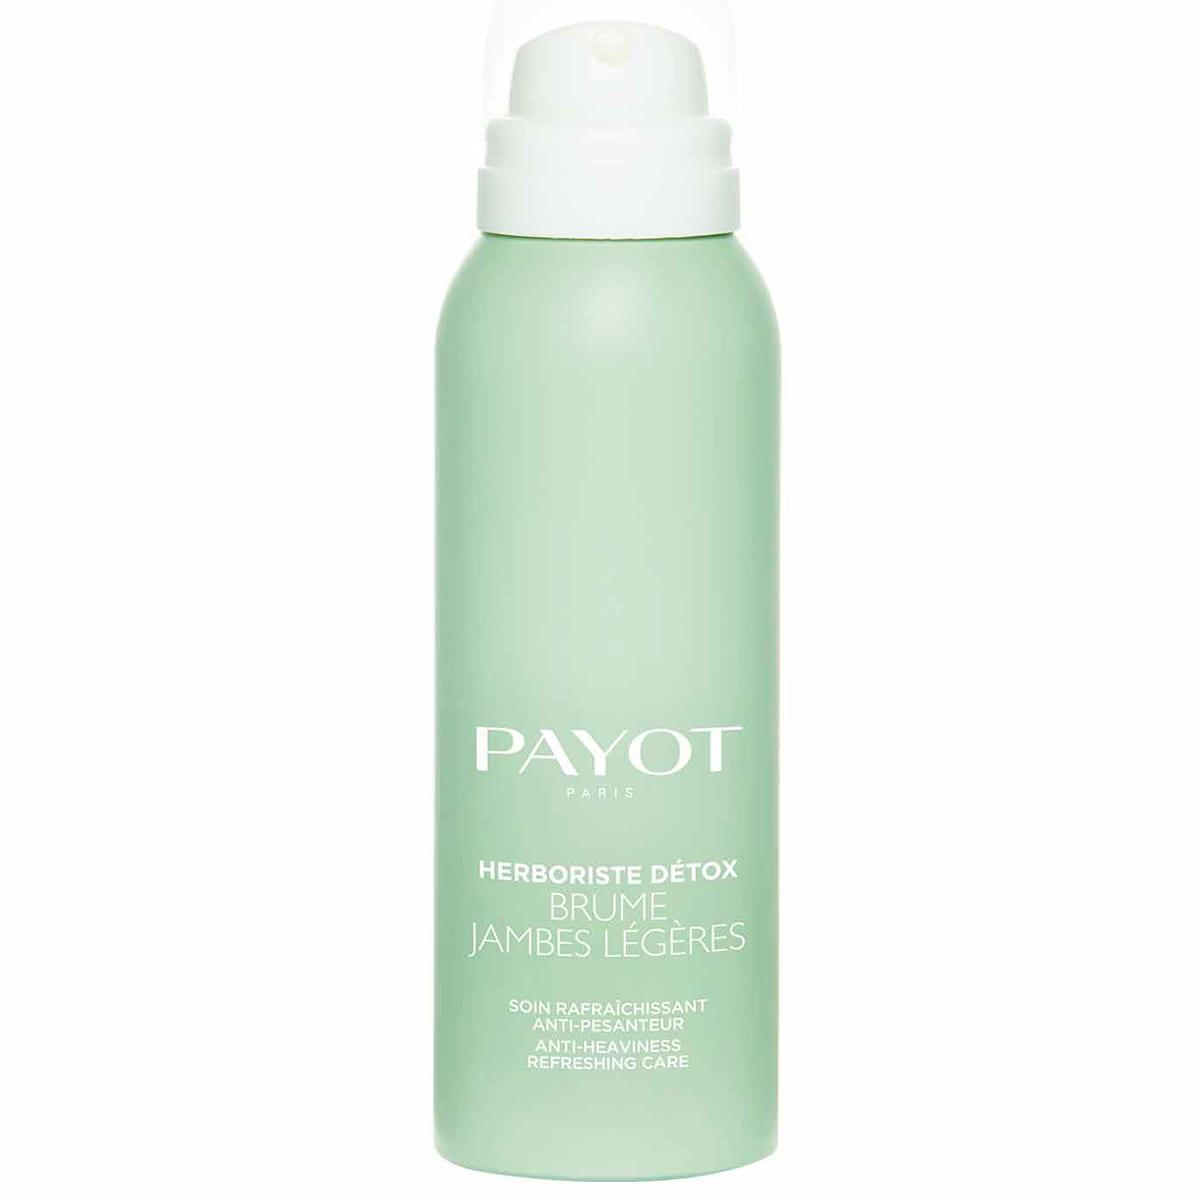 Payot - Herboriste Detox Brume Jambes Légères